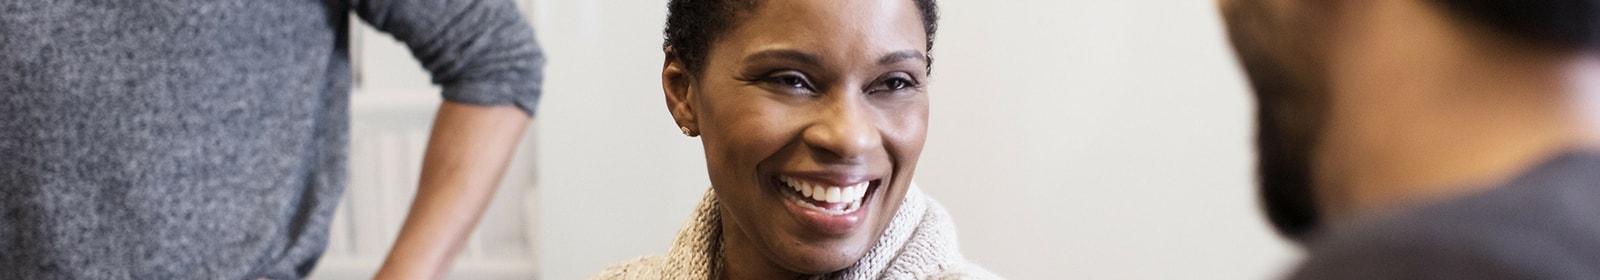 Woman in meeting smiles